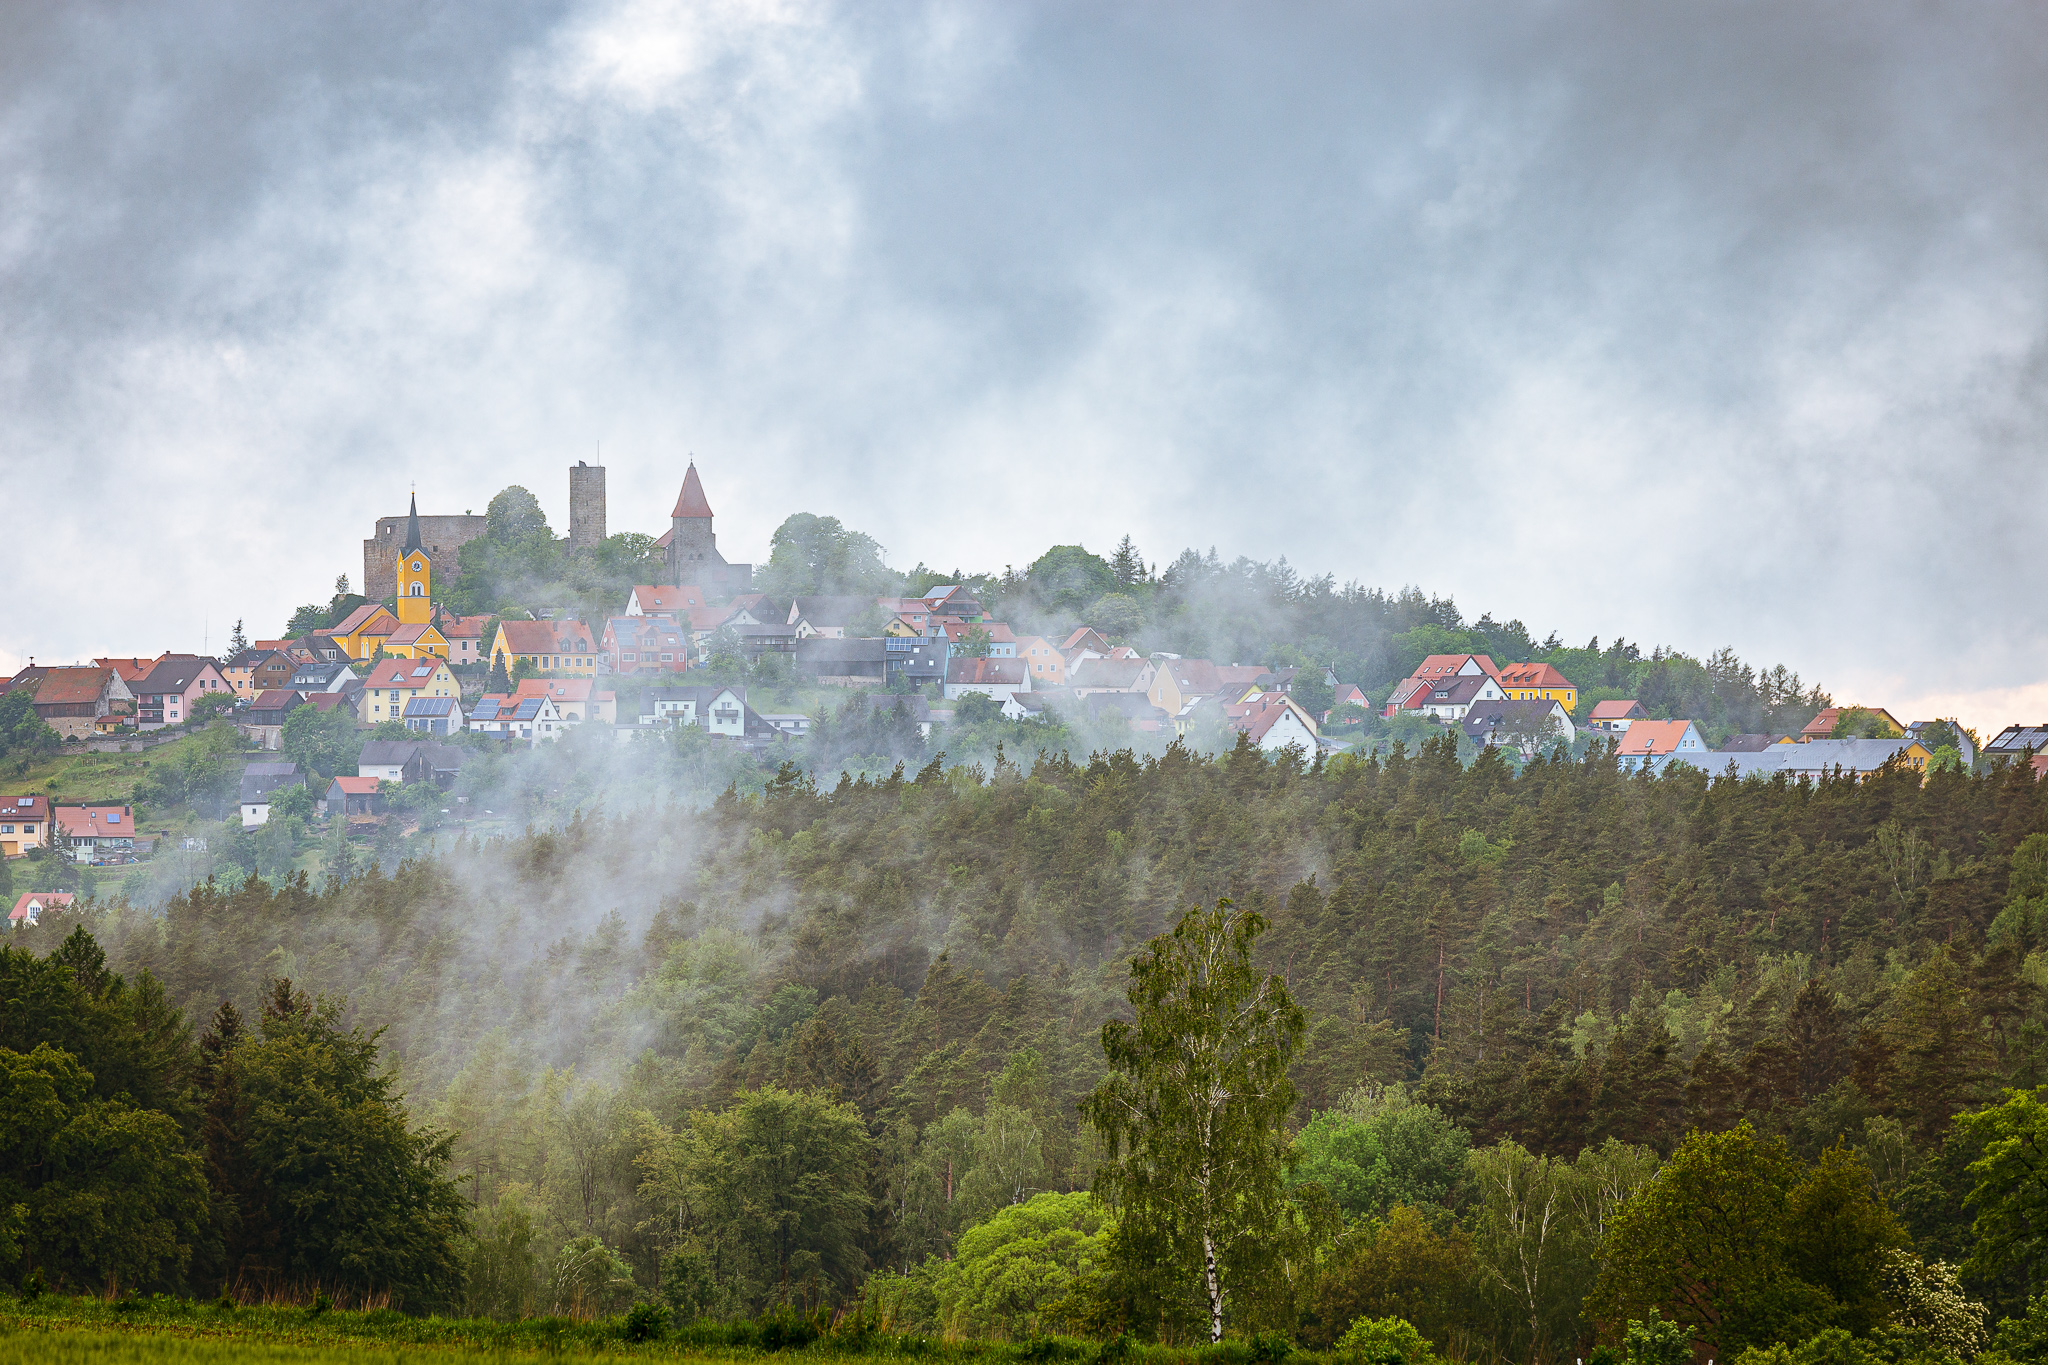 Wieselrieth, Germany